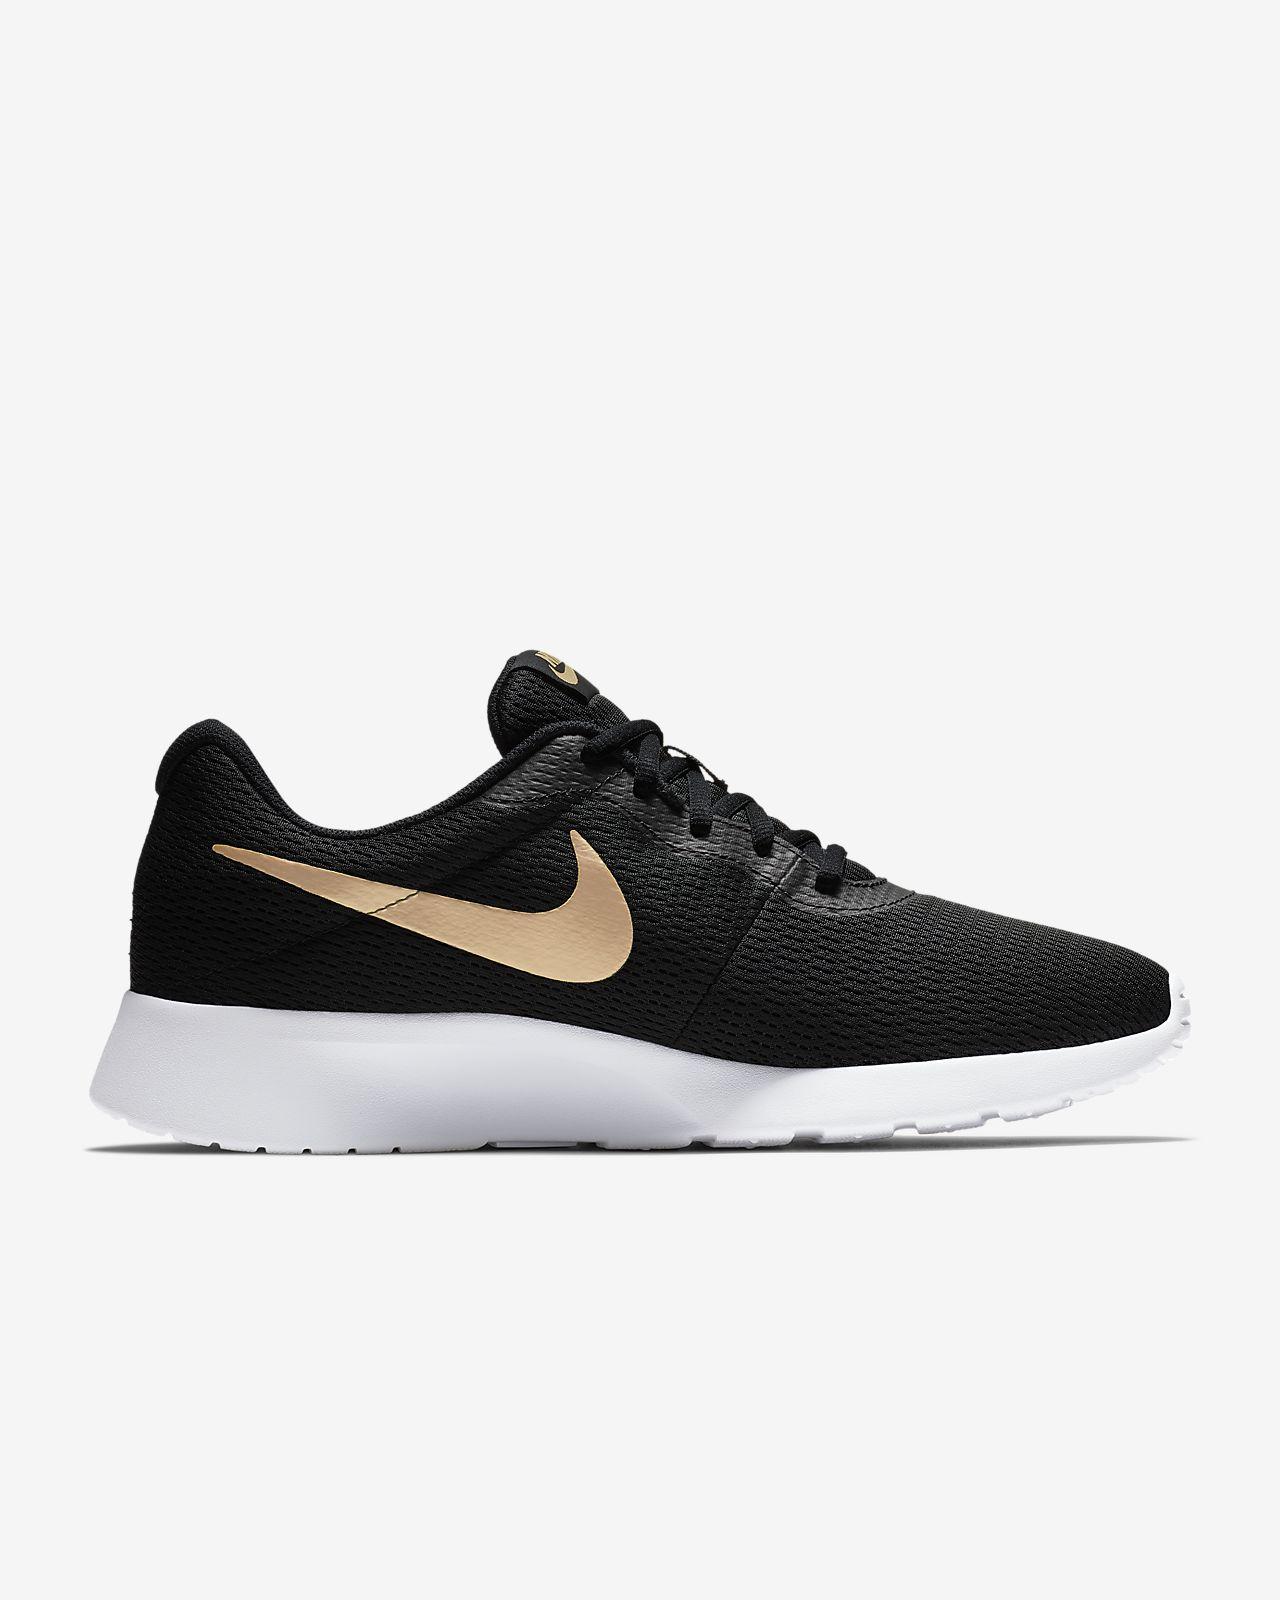 Low Resolution Nike Tanjun Men s Shoe Nike Tanjun Men s Shoe d01fa41f29